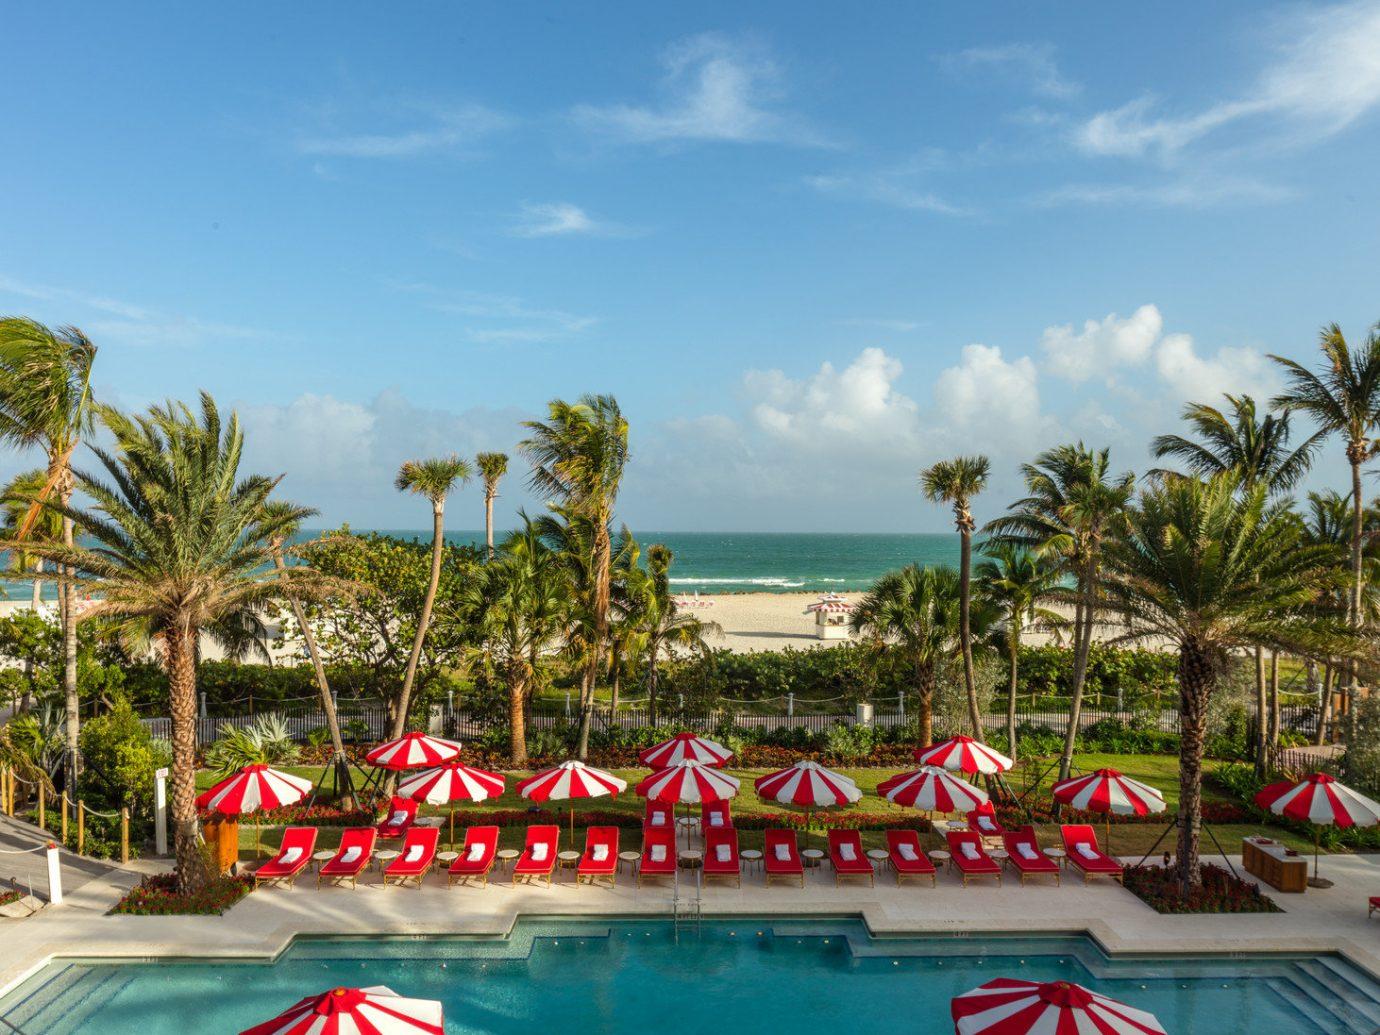 City Hotels Luxury Miami Miami Beach Romance sky outdoor tree leisure swimming pool Resort vacation estate amusement park Beach Water park caribbean palm lined